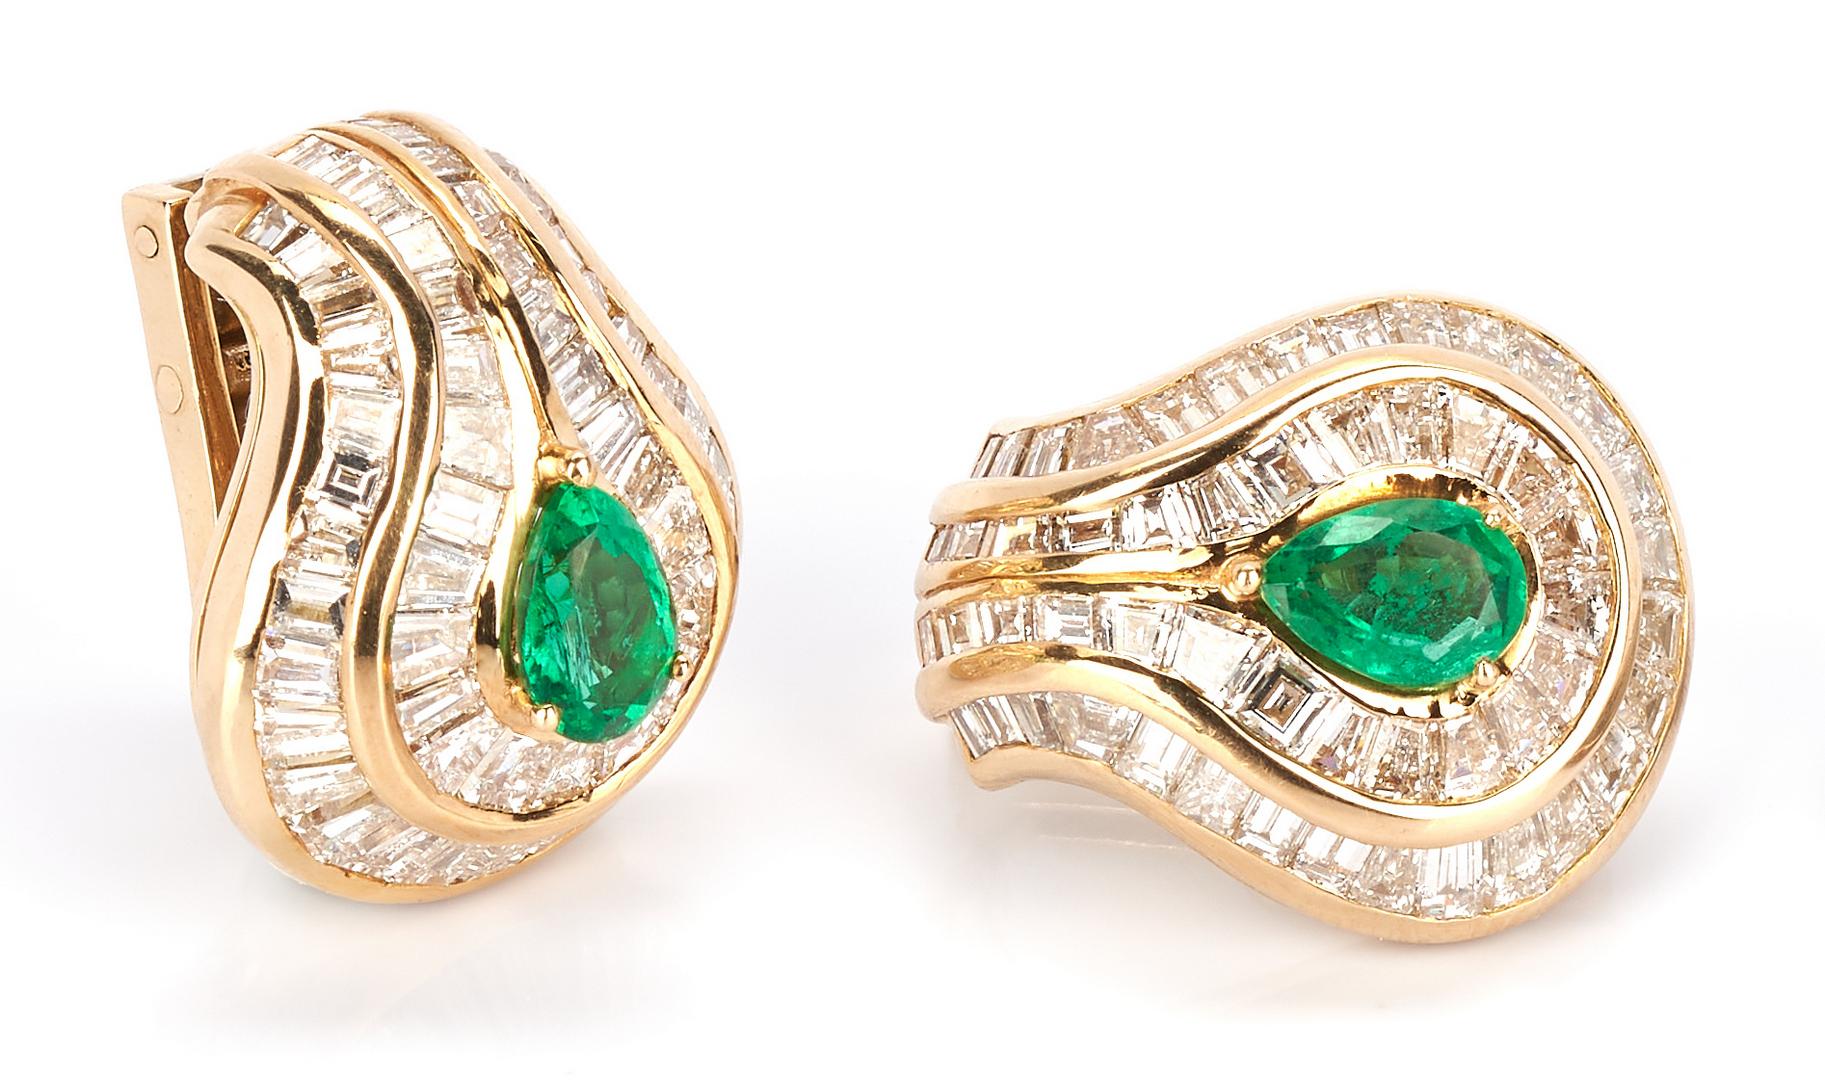 Lot 38: Piaget High Jewelry Earrings Set